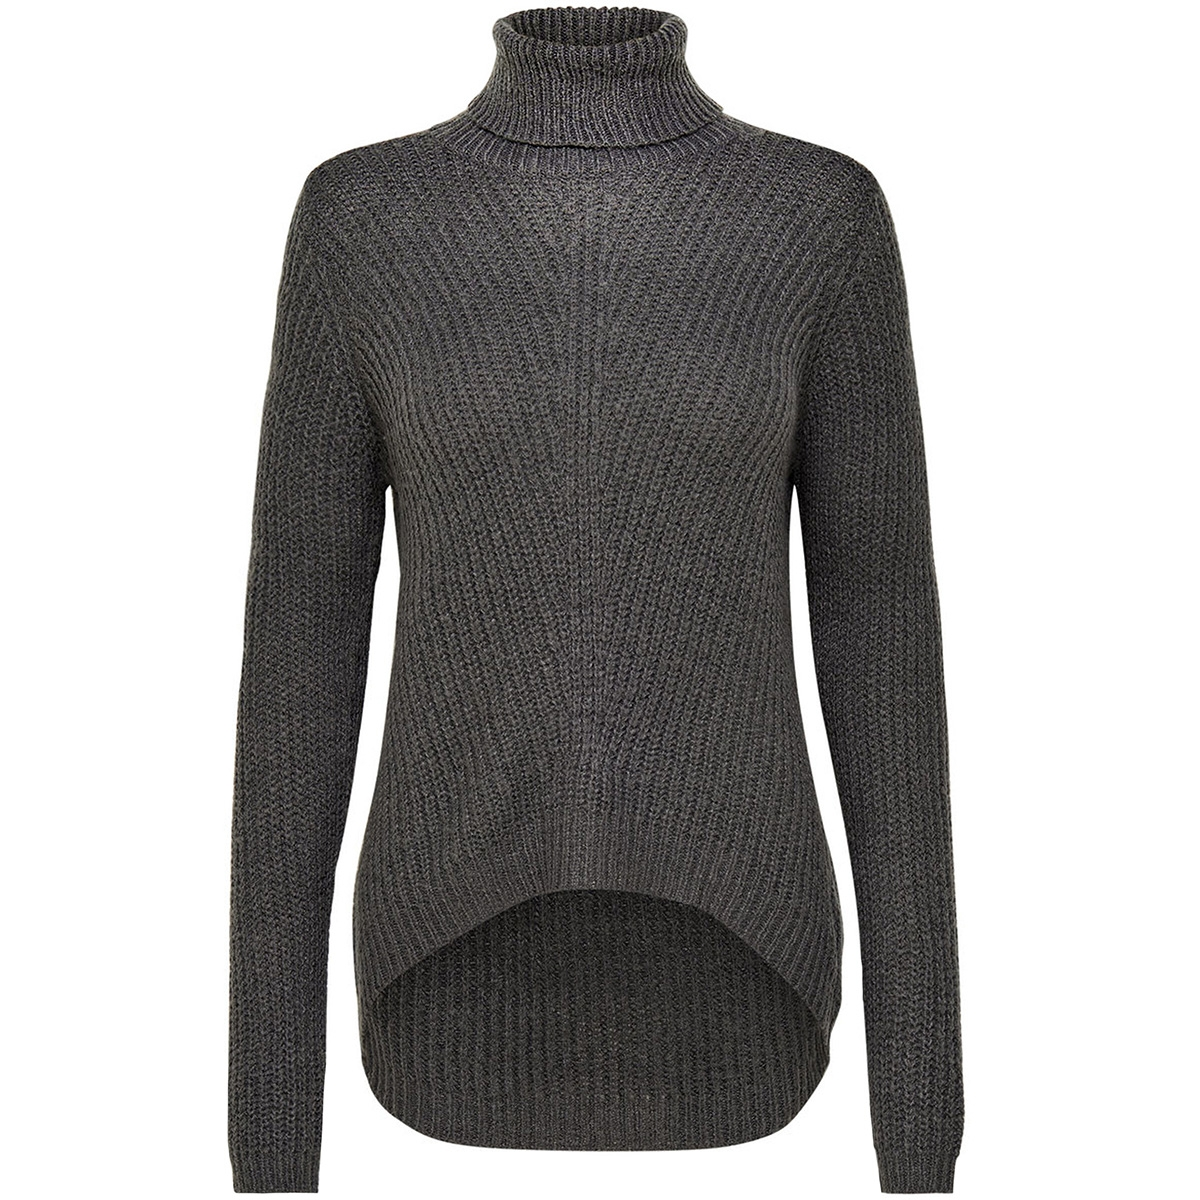 jdysanna l/s highneck pullover knt 15141006 jacqueline de yong trui dark grey melange